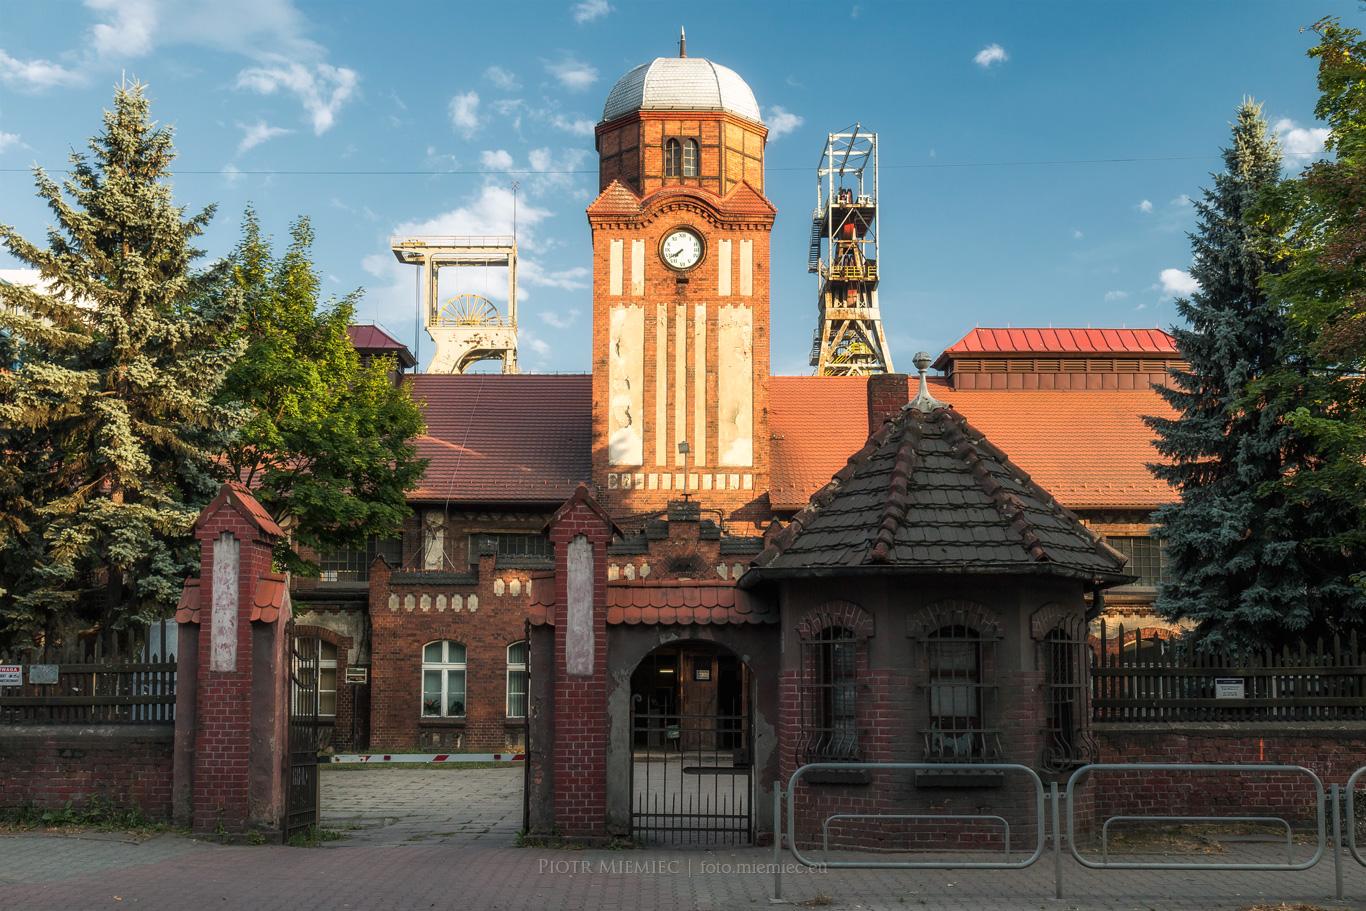 Kopalnia Bielszowice